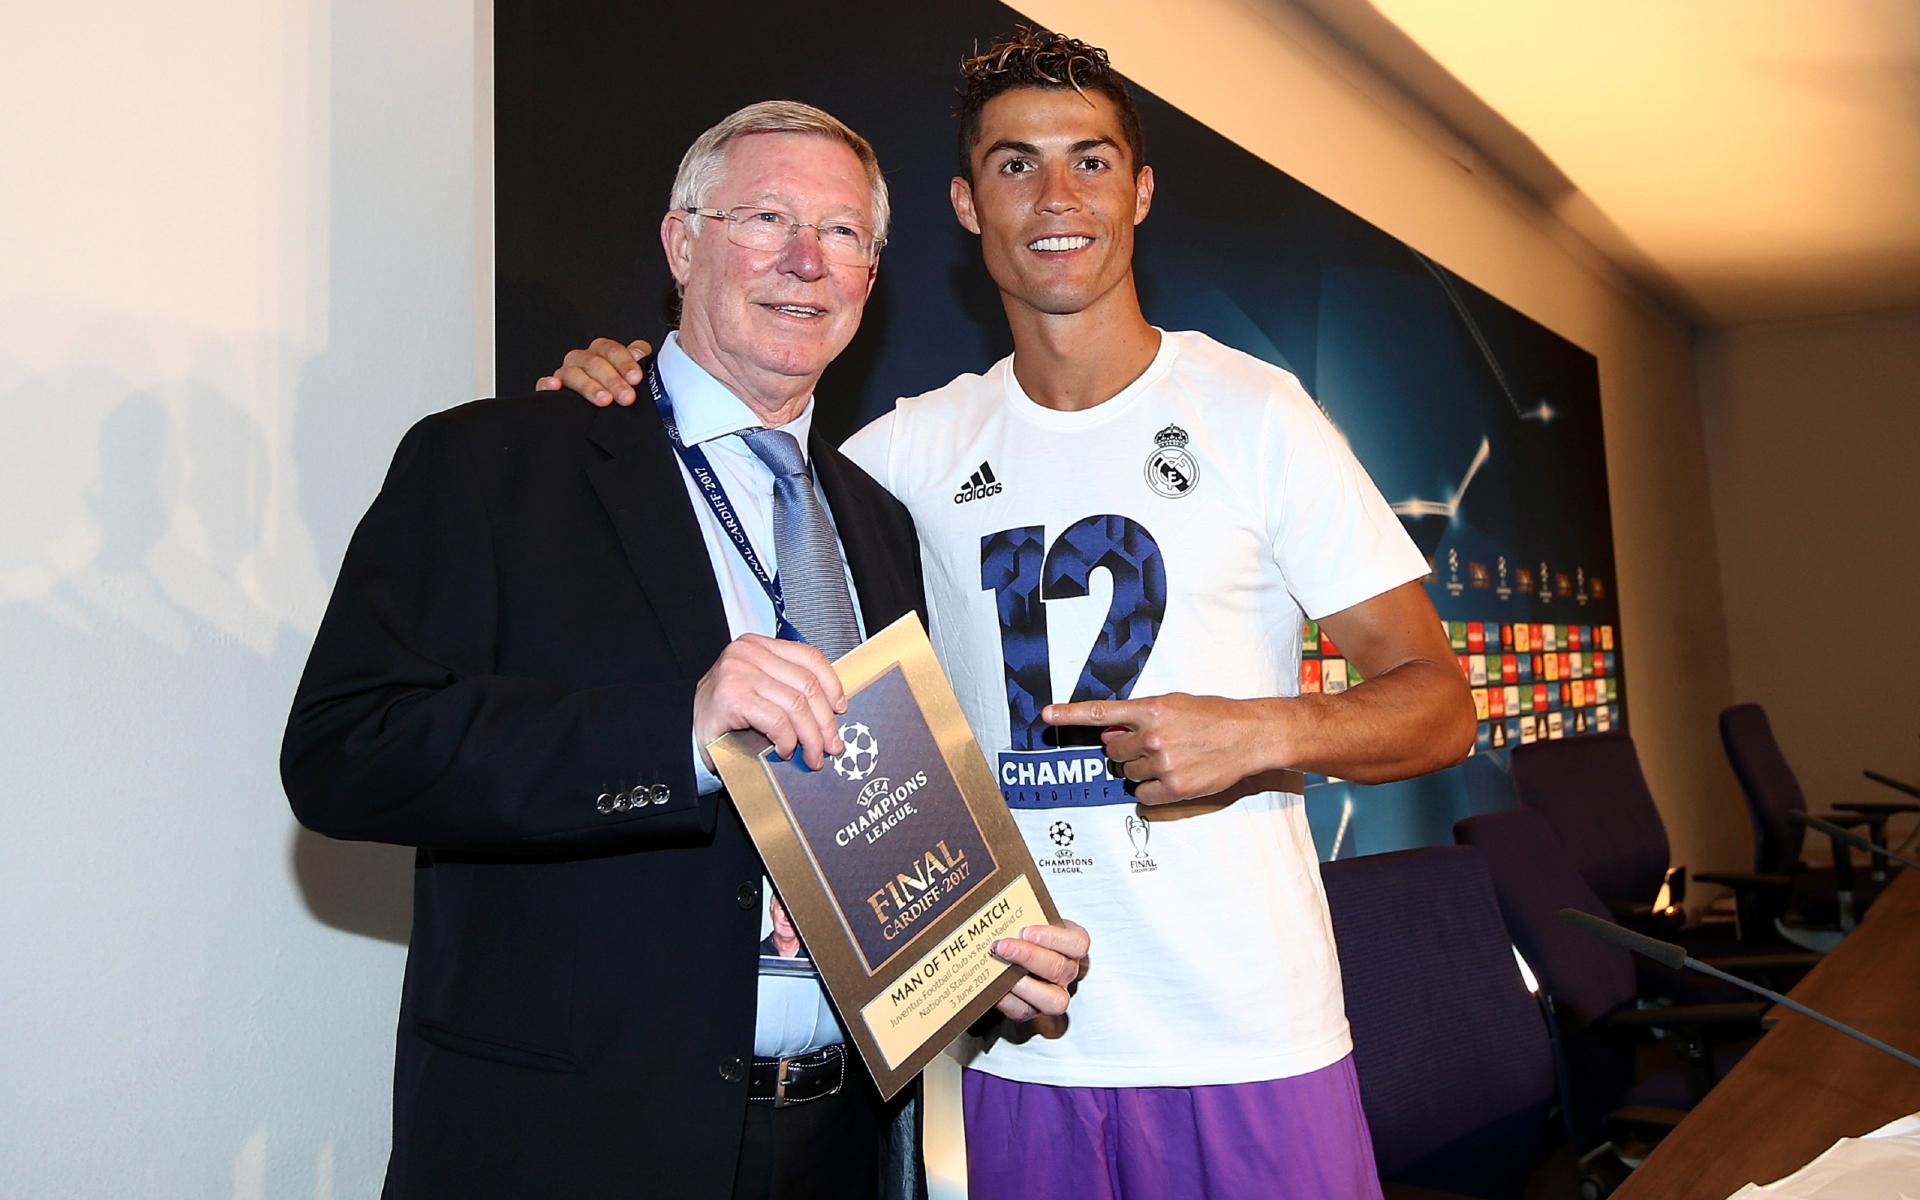 Фото: Handout/UEFA via Getty Images